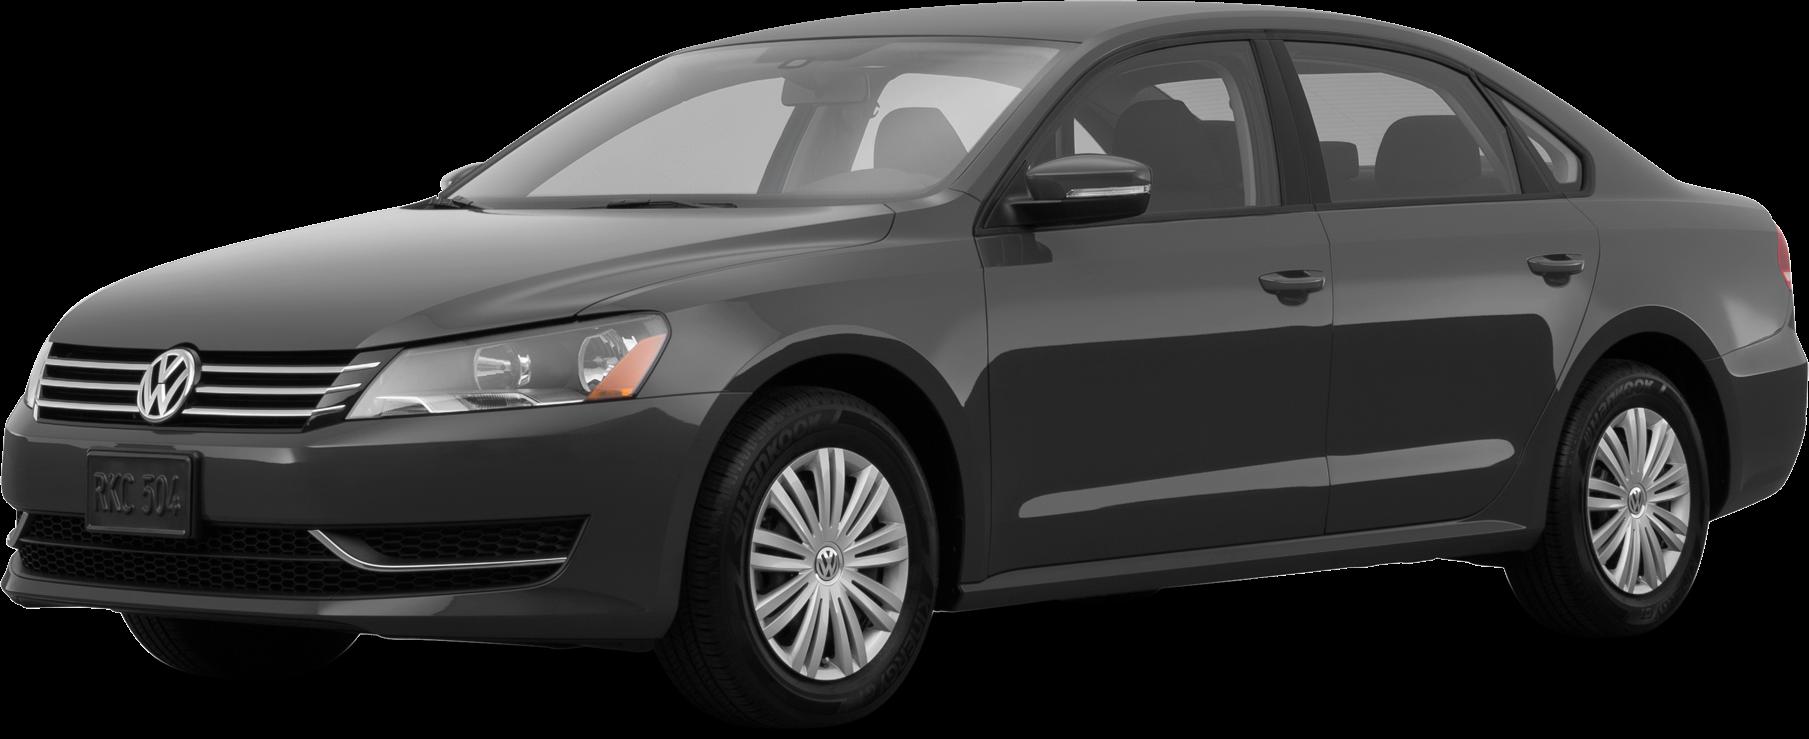 2015 Volkswagen Jetta | Pricing, Ratings, Expert Review